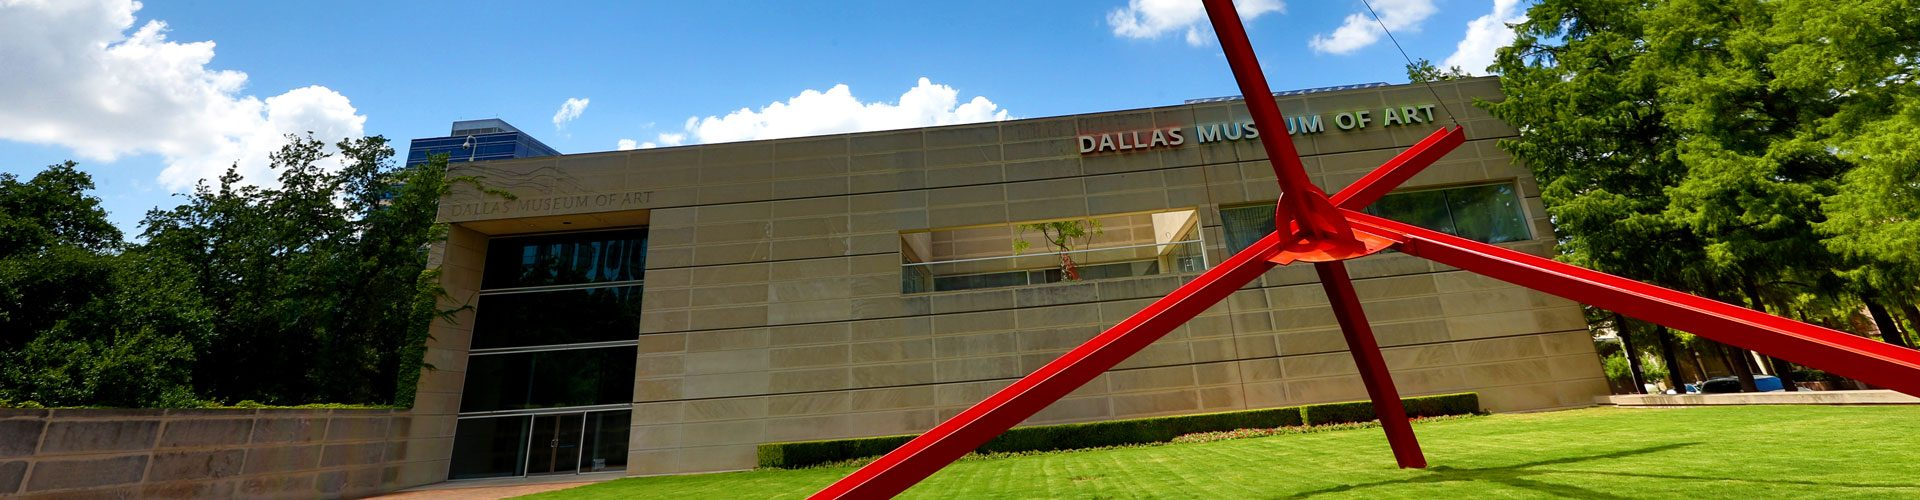 Dallas Museum